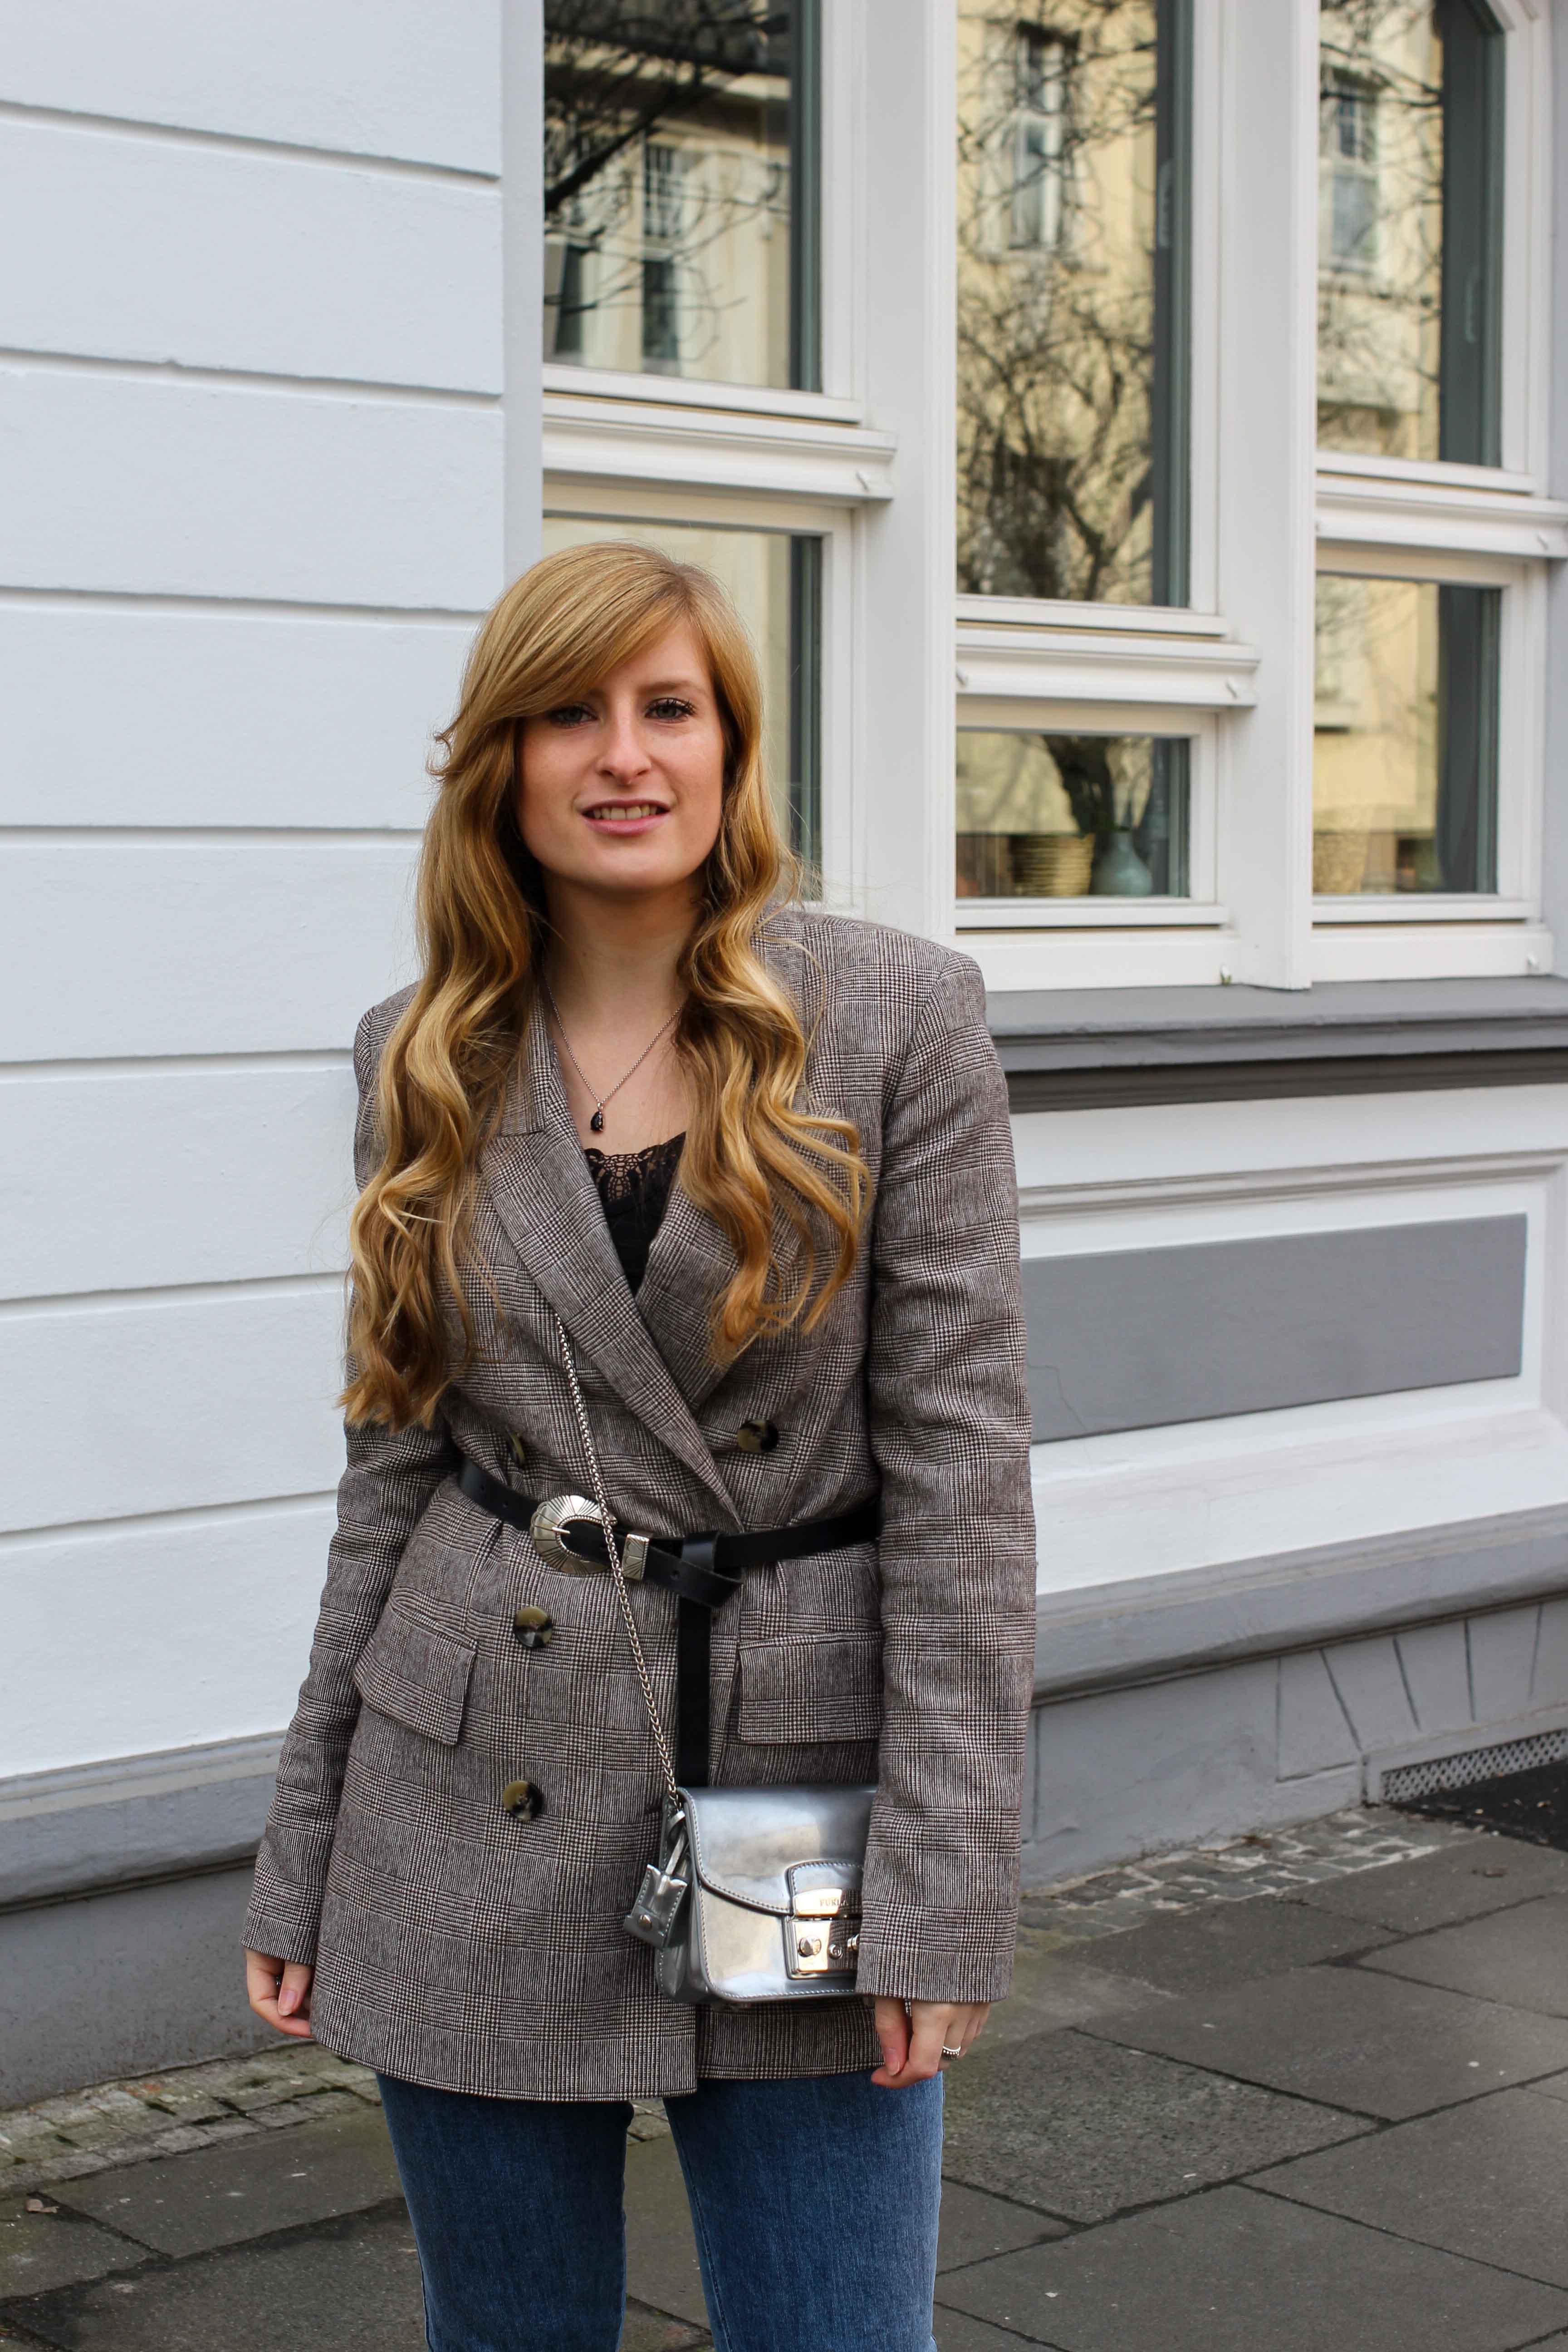 Karierter Blazer Spitzentop Hüftgürtel Karoblazer kombinieren Outfit Hebst Winter Furla silber Nietenboots Modeblog Bonn 2